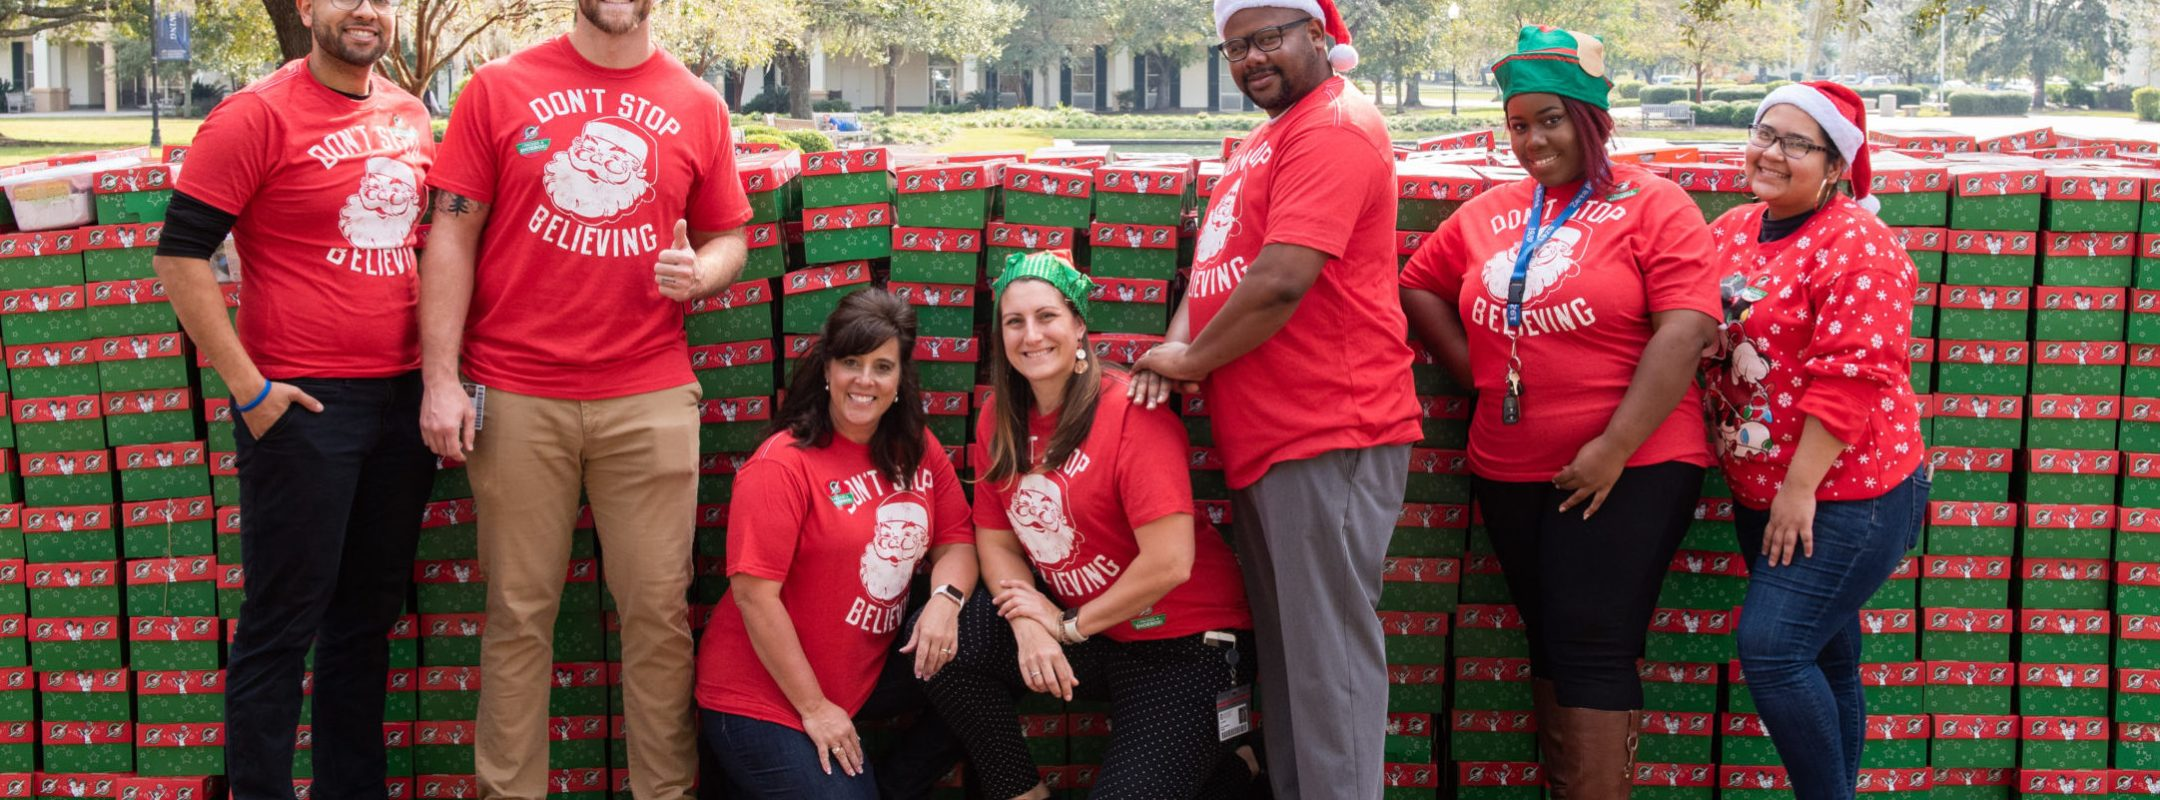 Organizers from Operation Christmas Child at Charleston Southern University